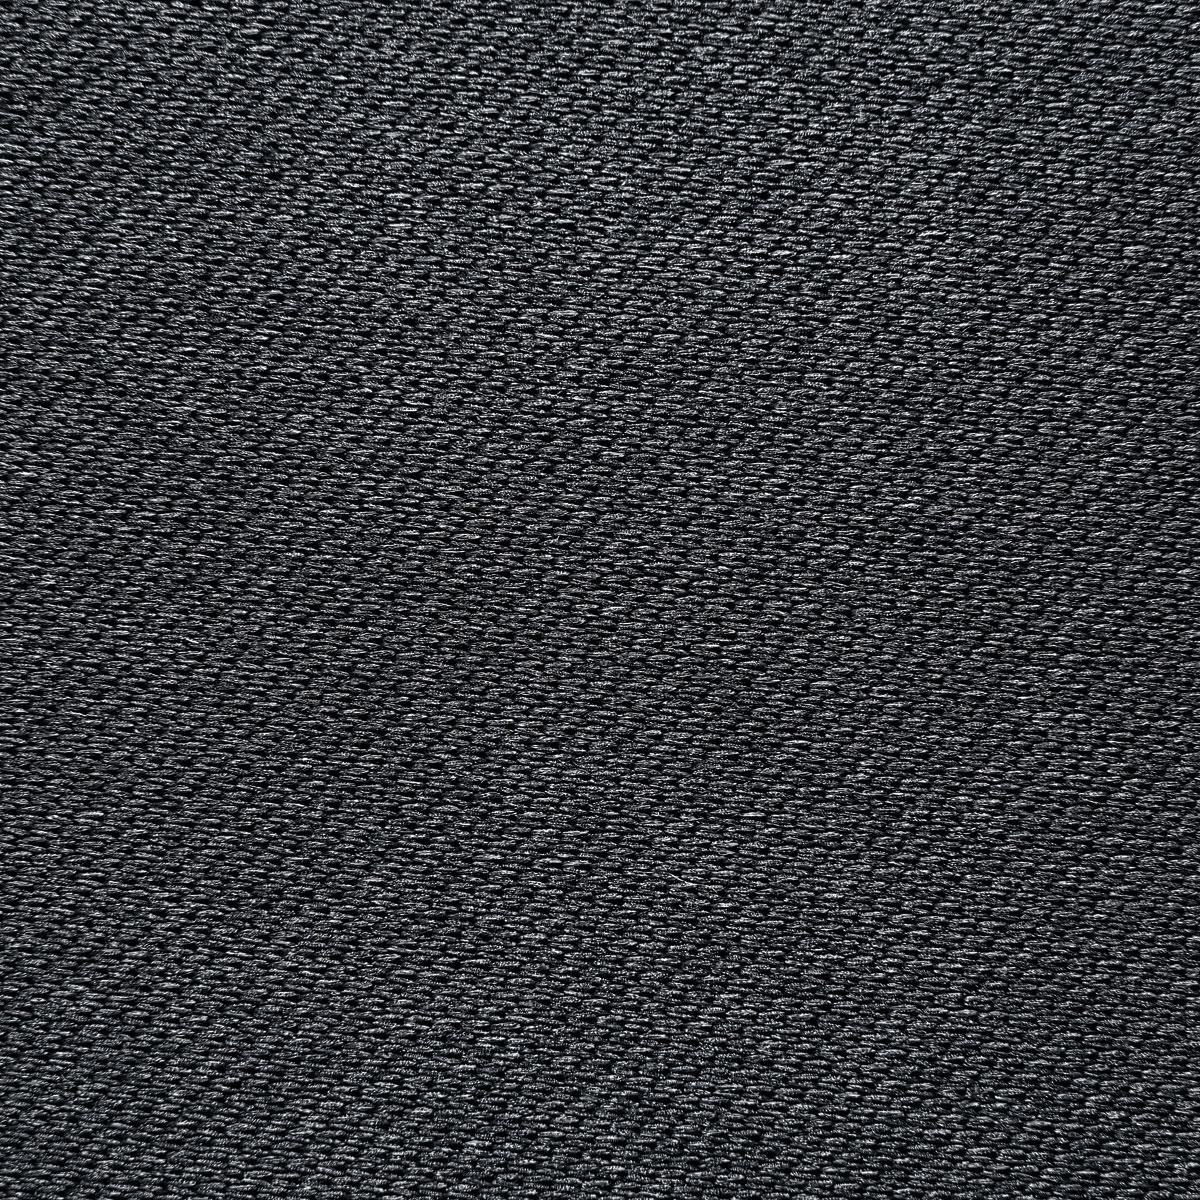 Corsair Vengeance MM200 Standard Tapis De Souris Corsair